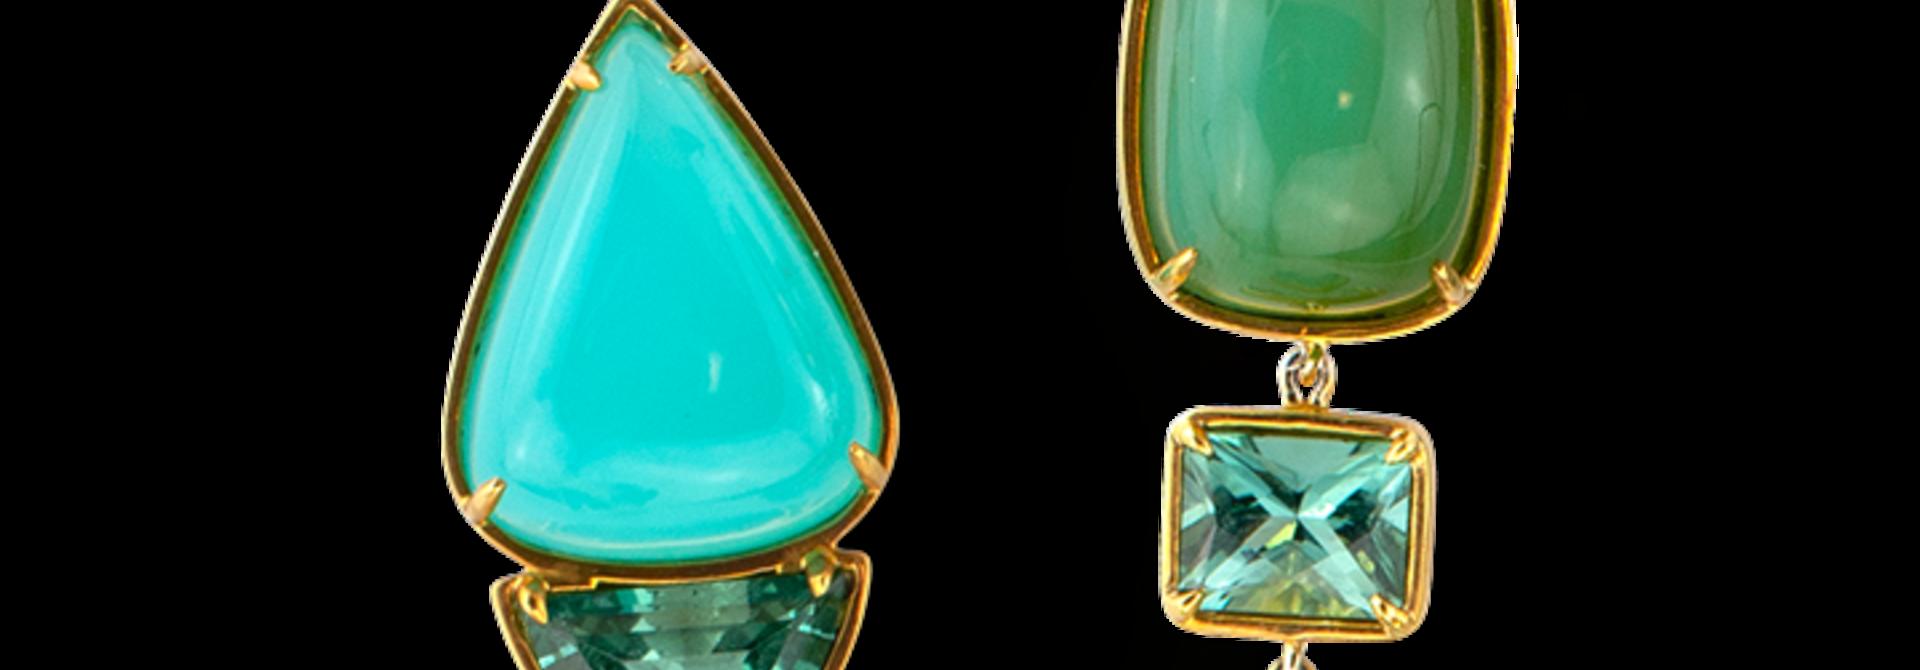 Peruvian Opal and Lagoon Tourmaline Earrings